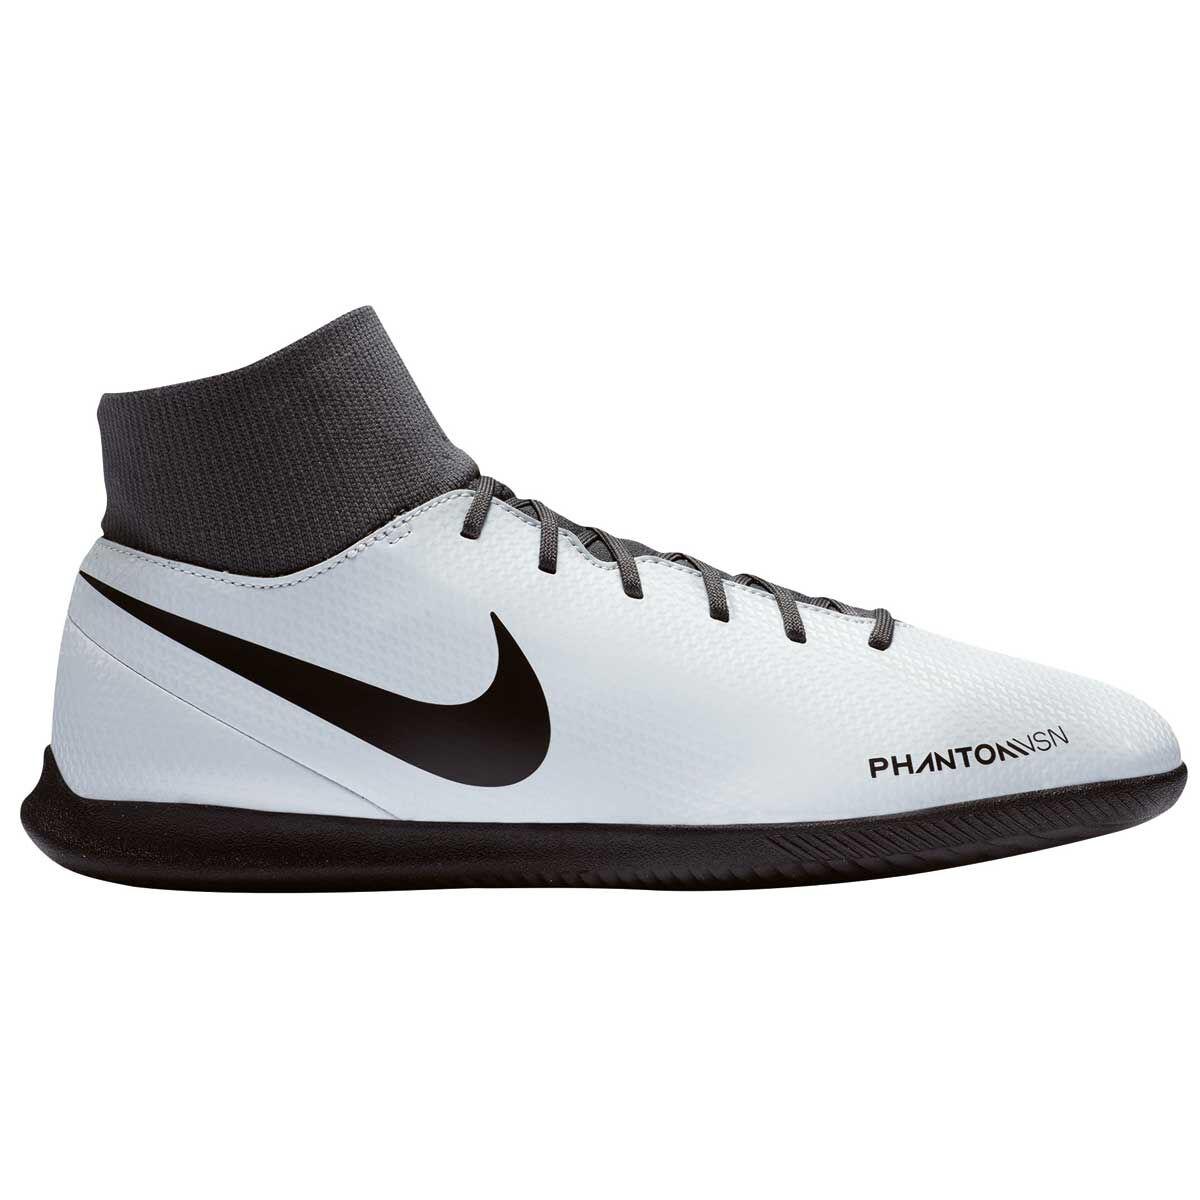 Nike Phantom Visionx Club Mens Indoor